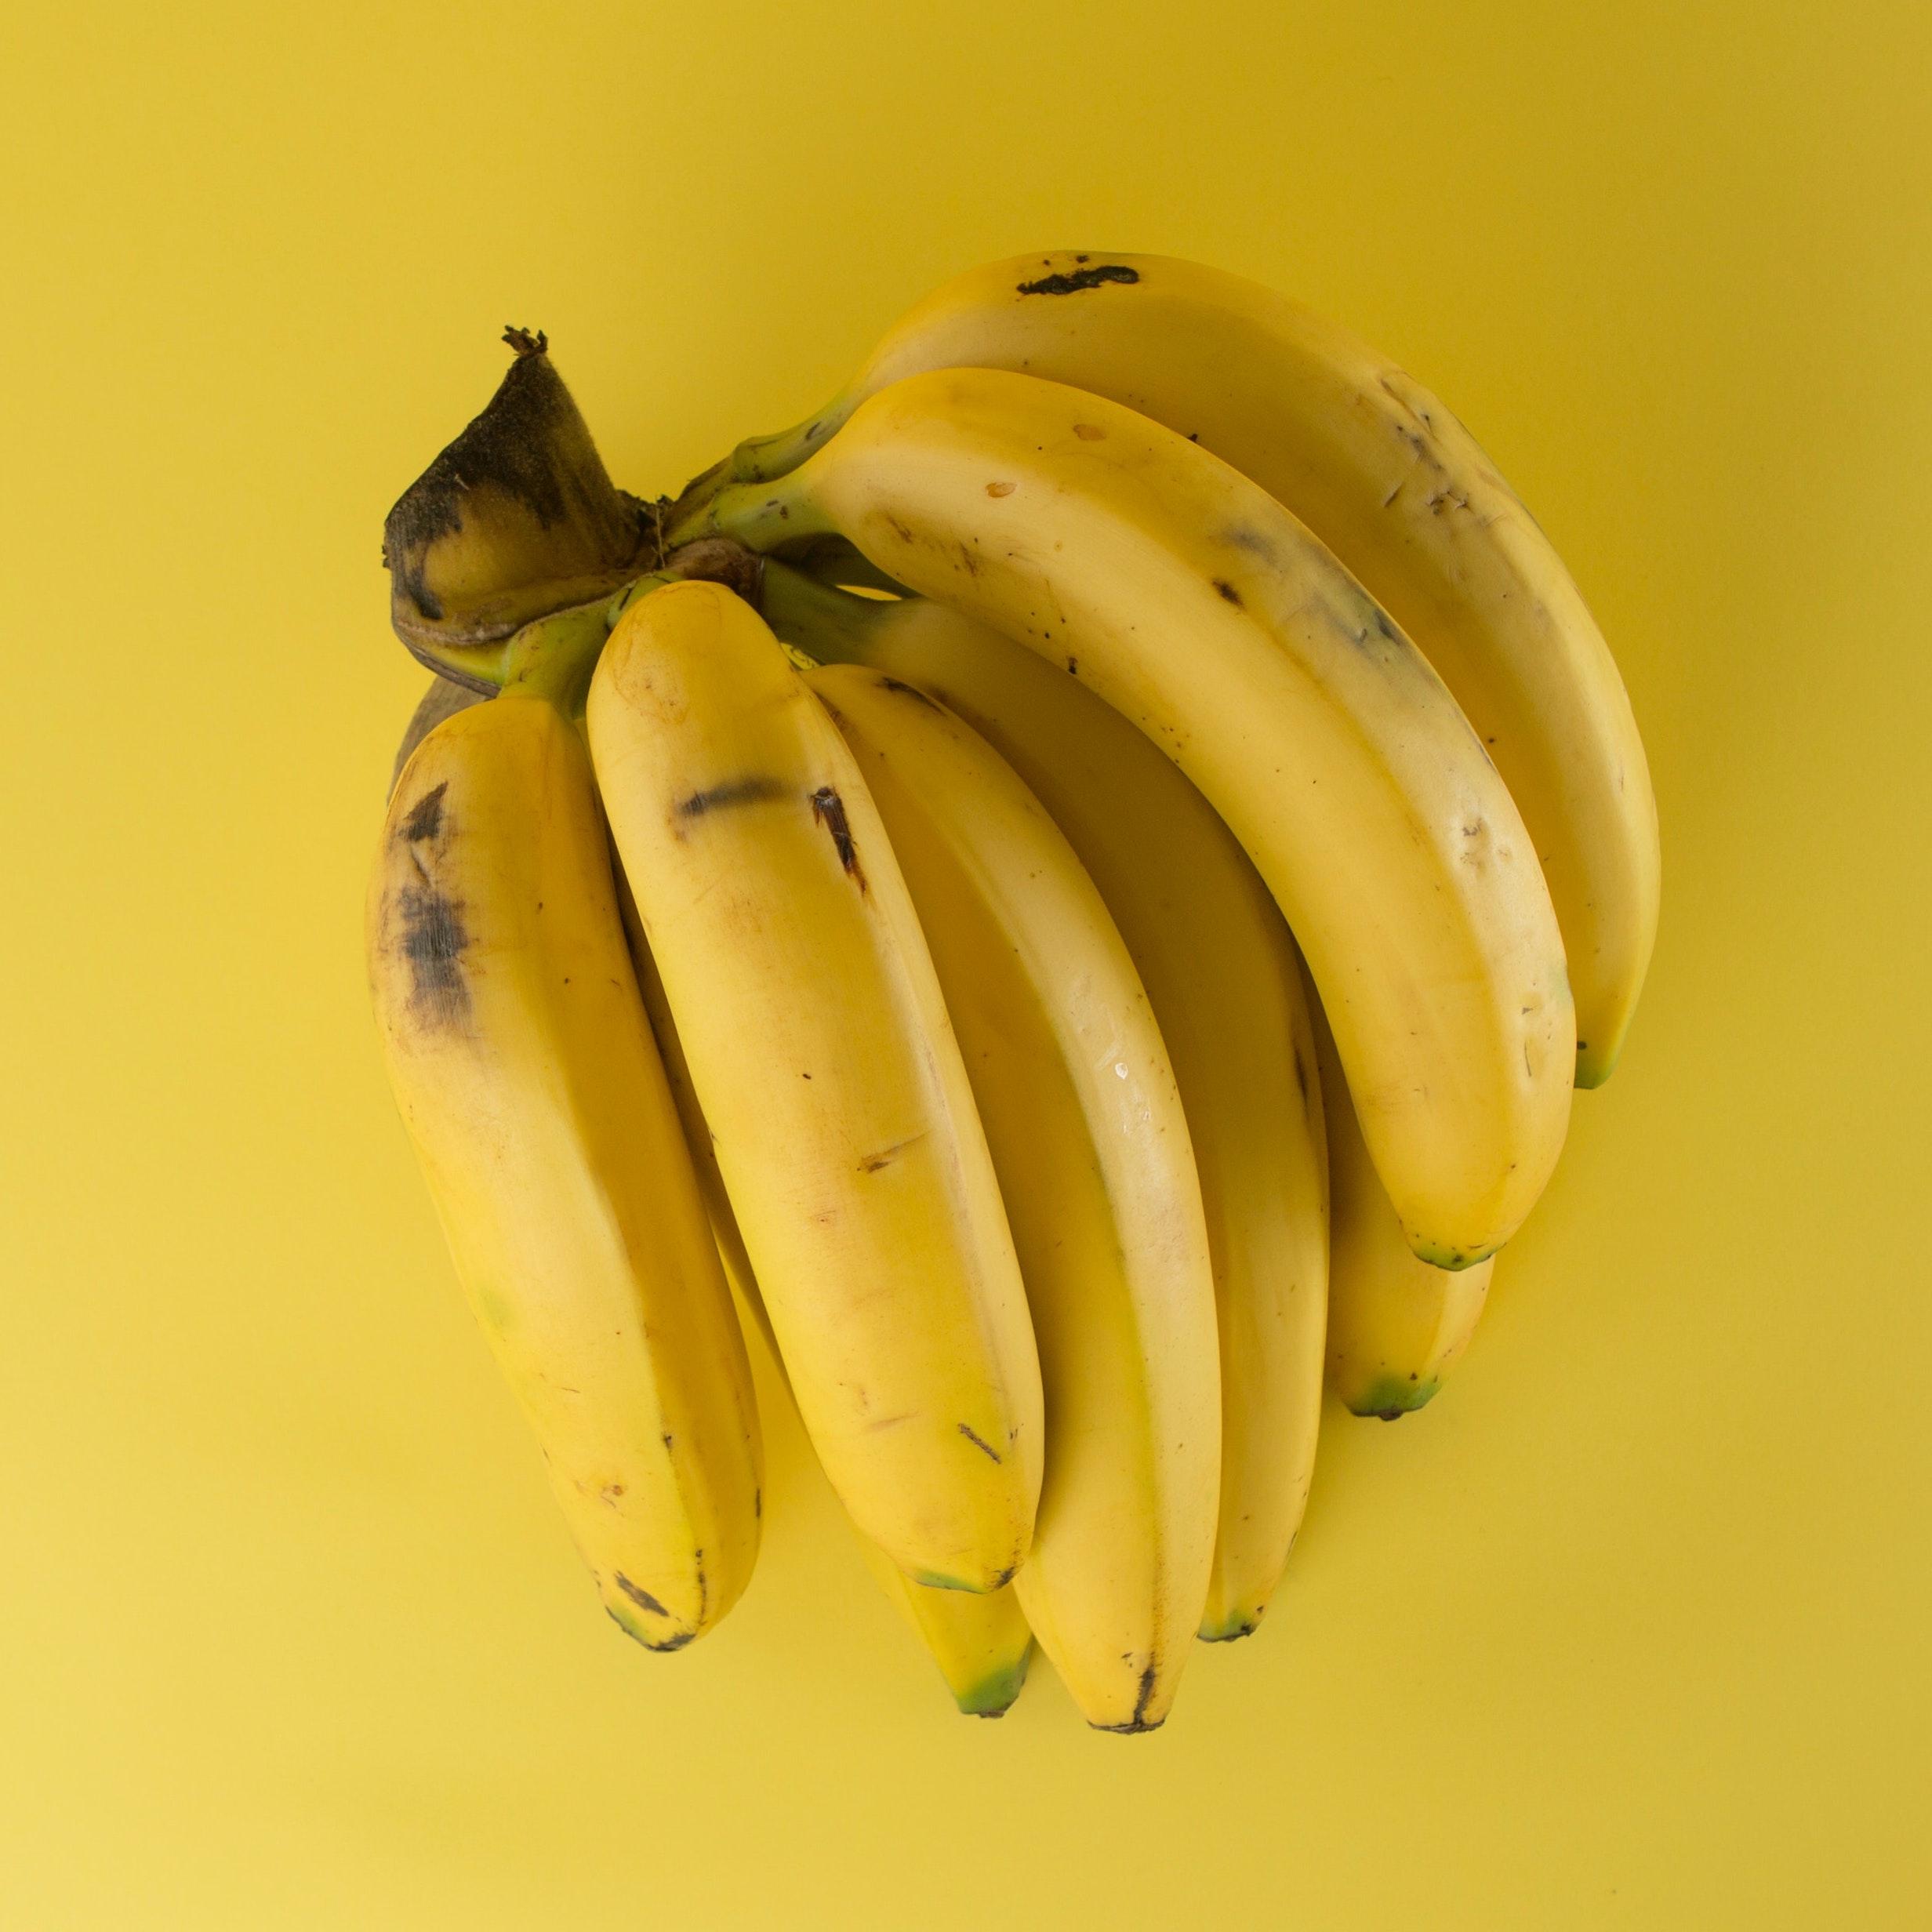 yellow-bananas-61127